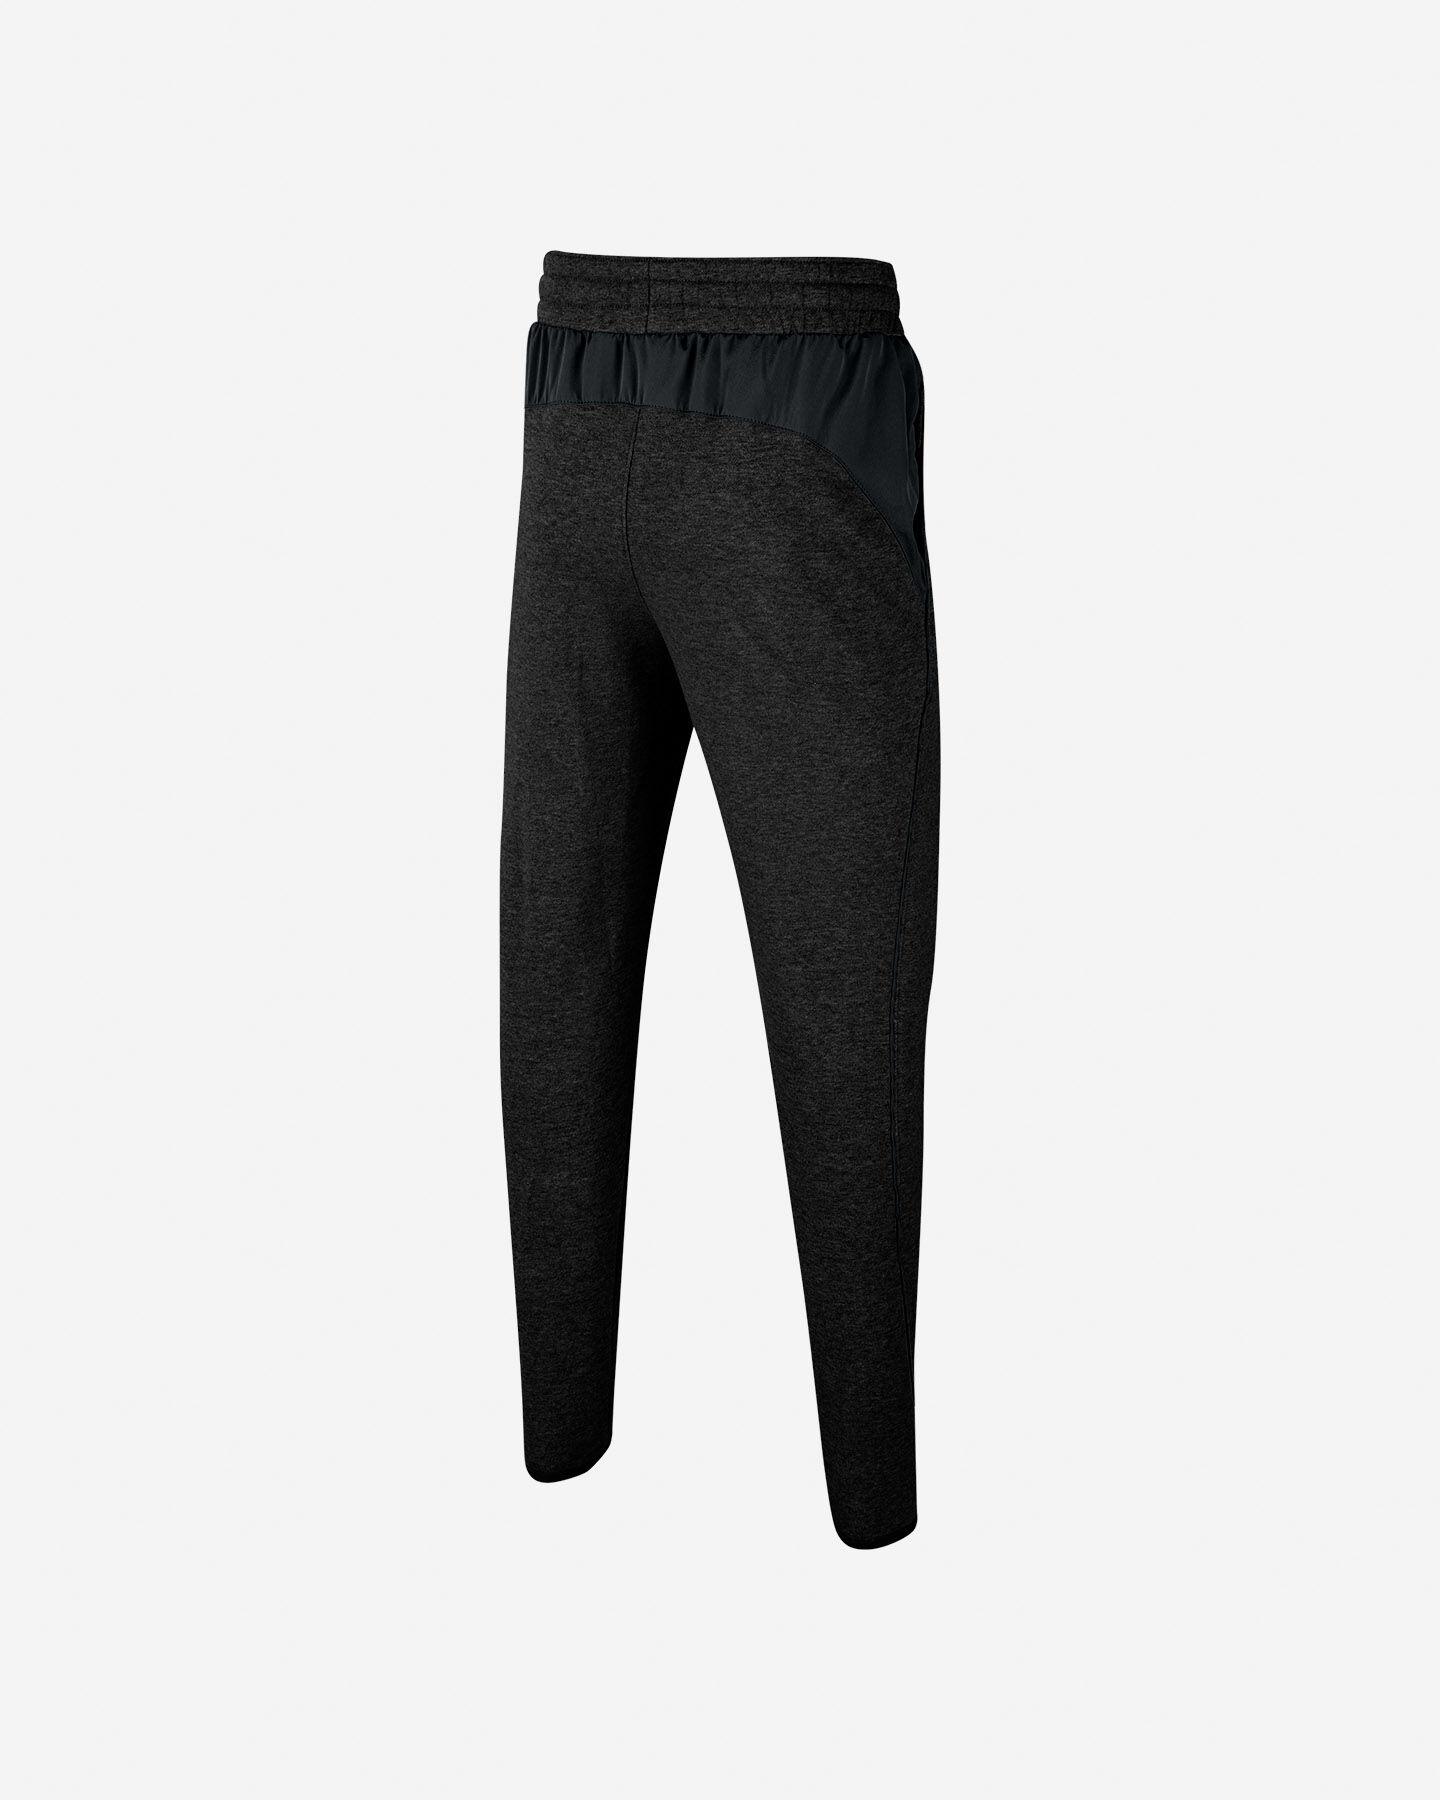 Pantalone NIKE SPORTSWEAR JR S5225768 scatto 1